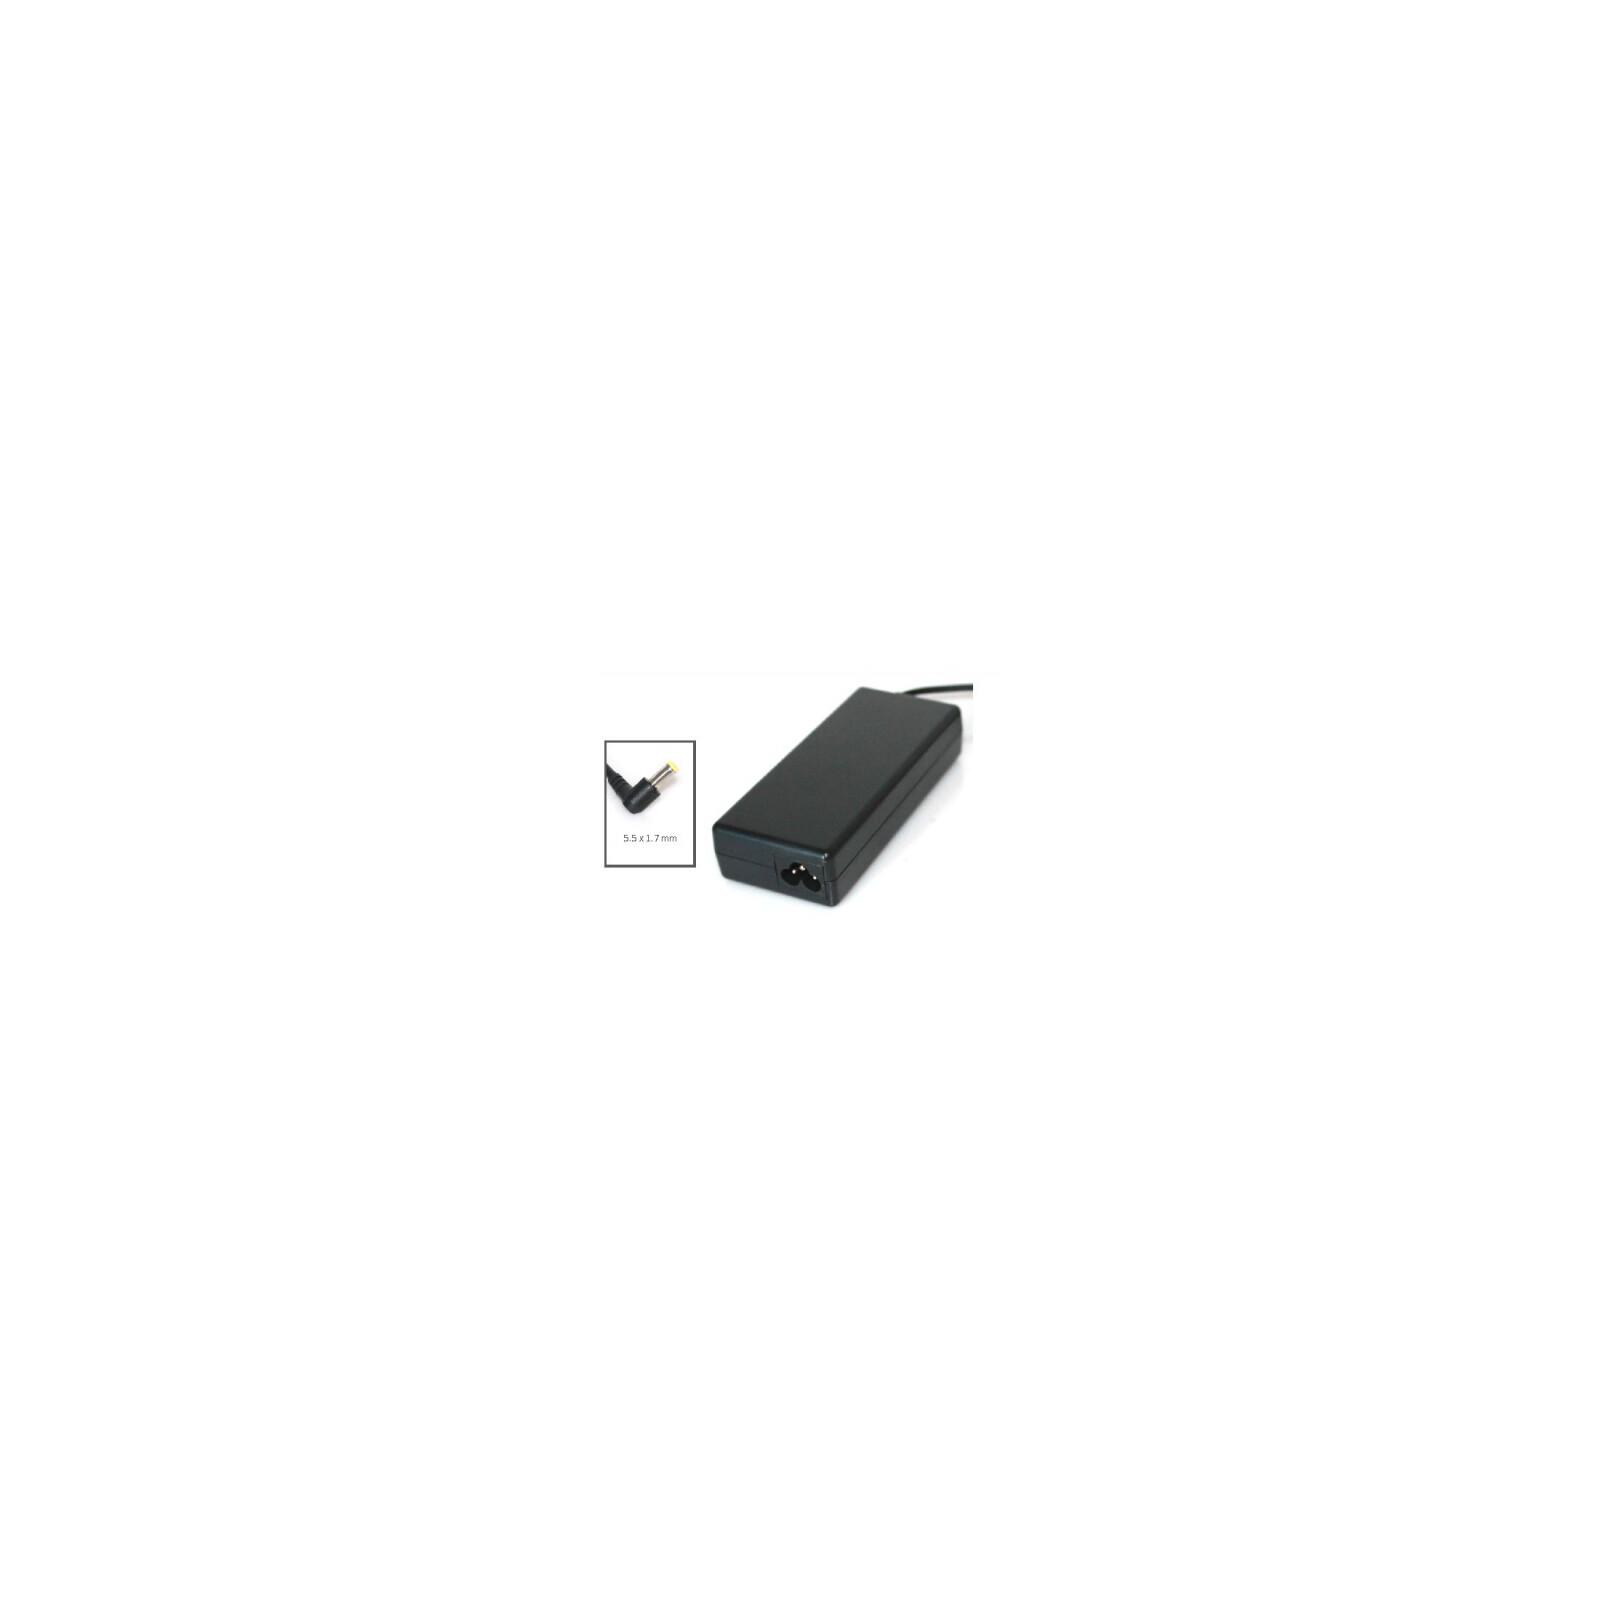 AGI Netzteil Acer Aspire 5100 90W